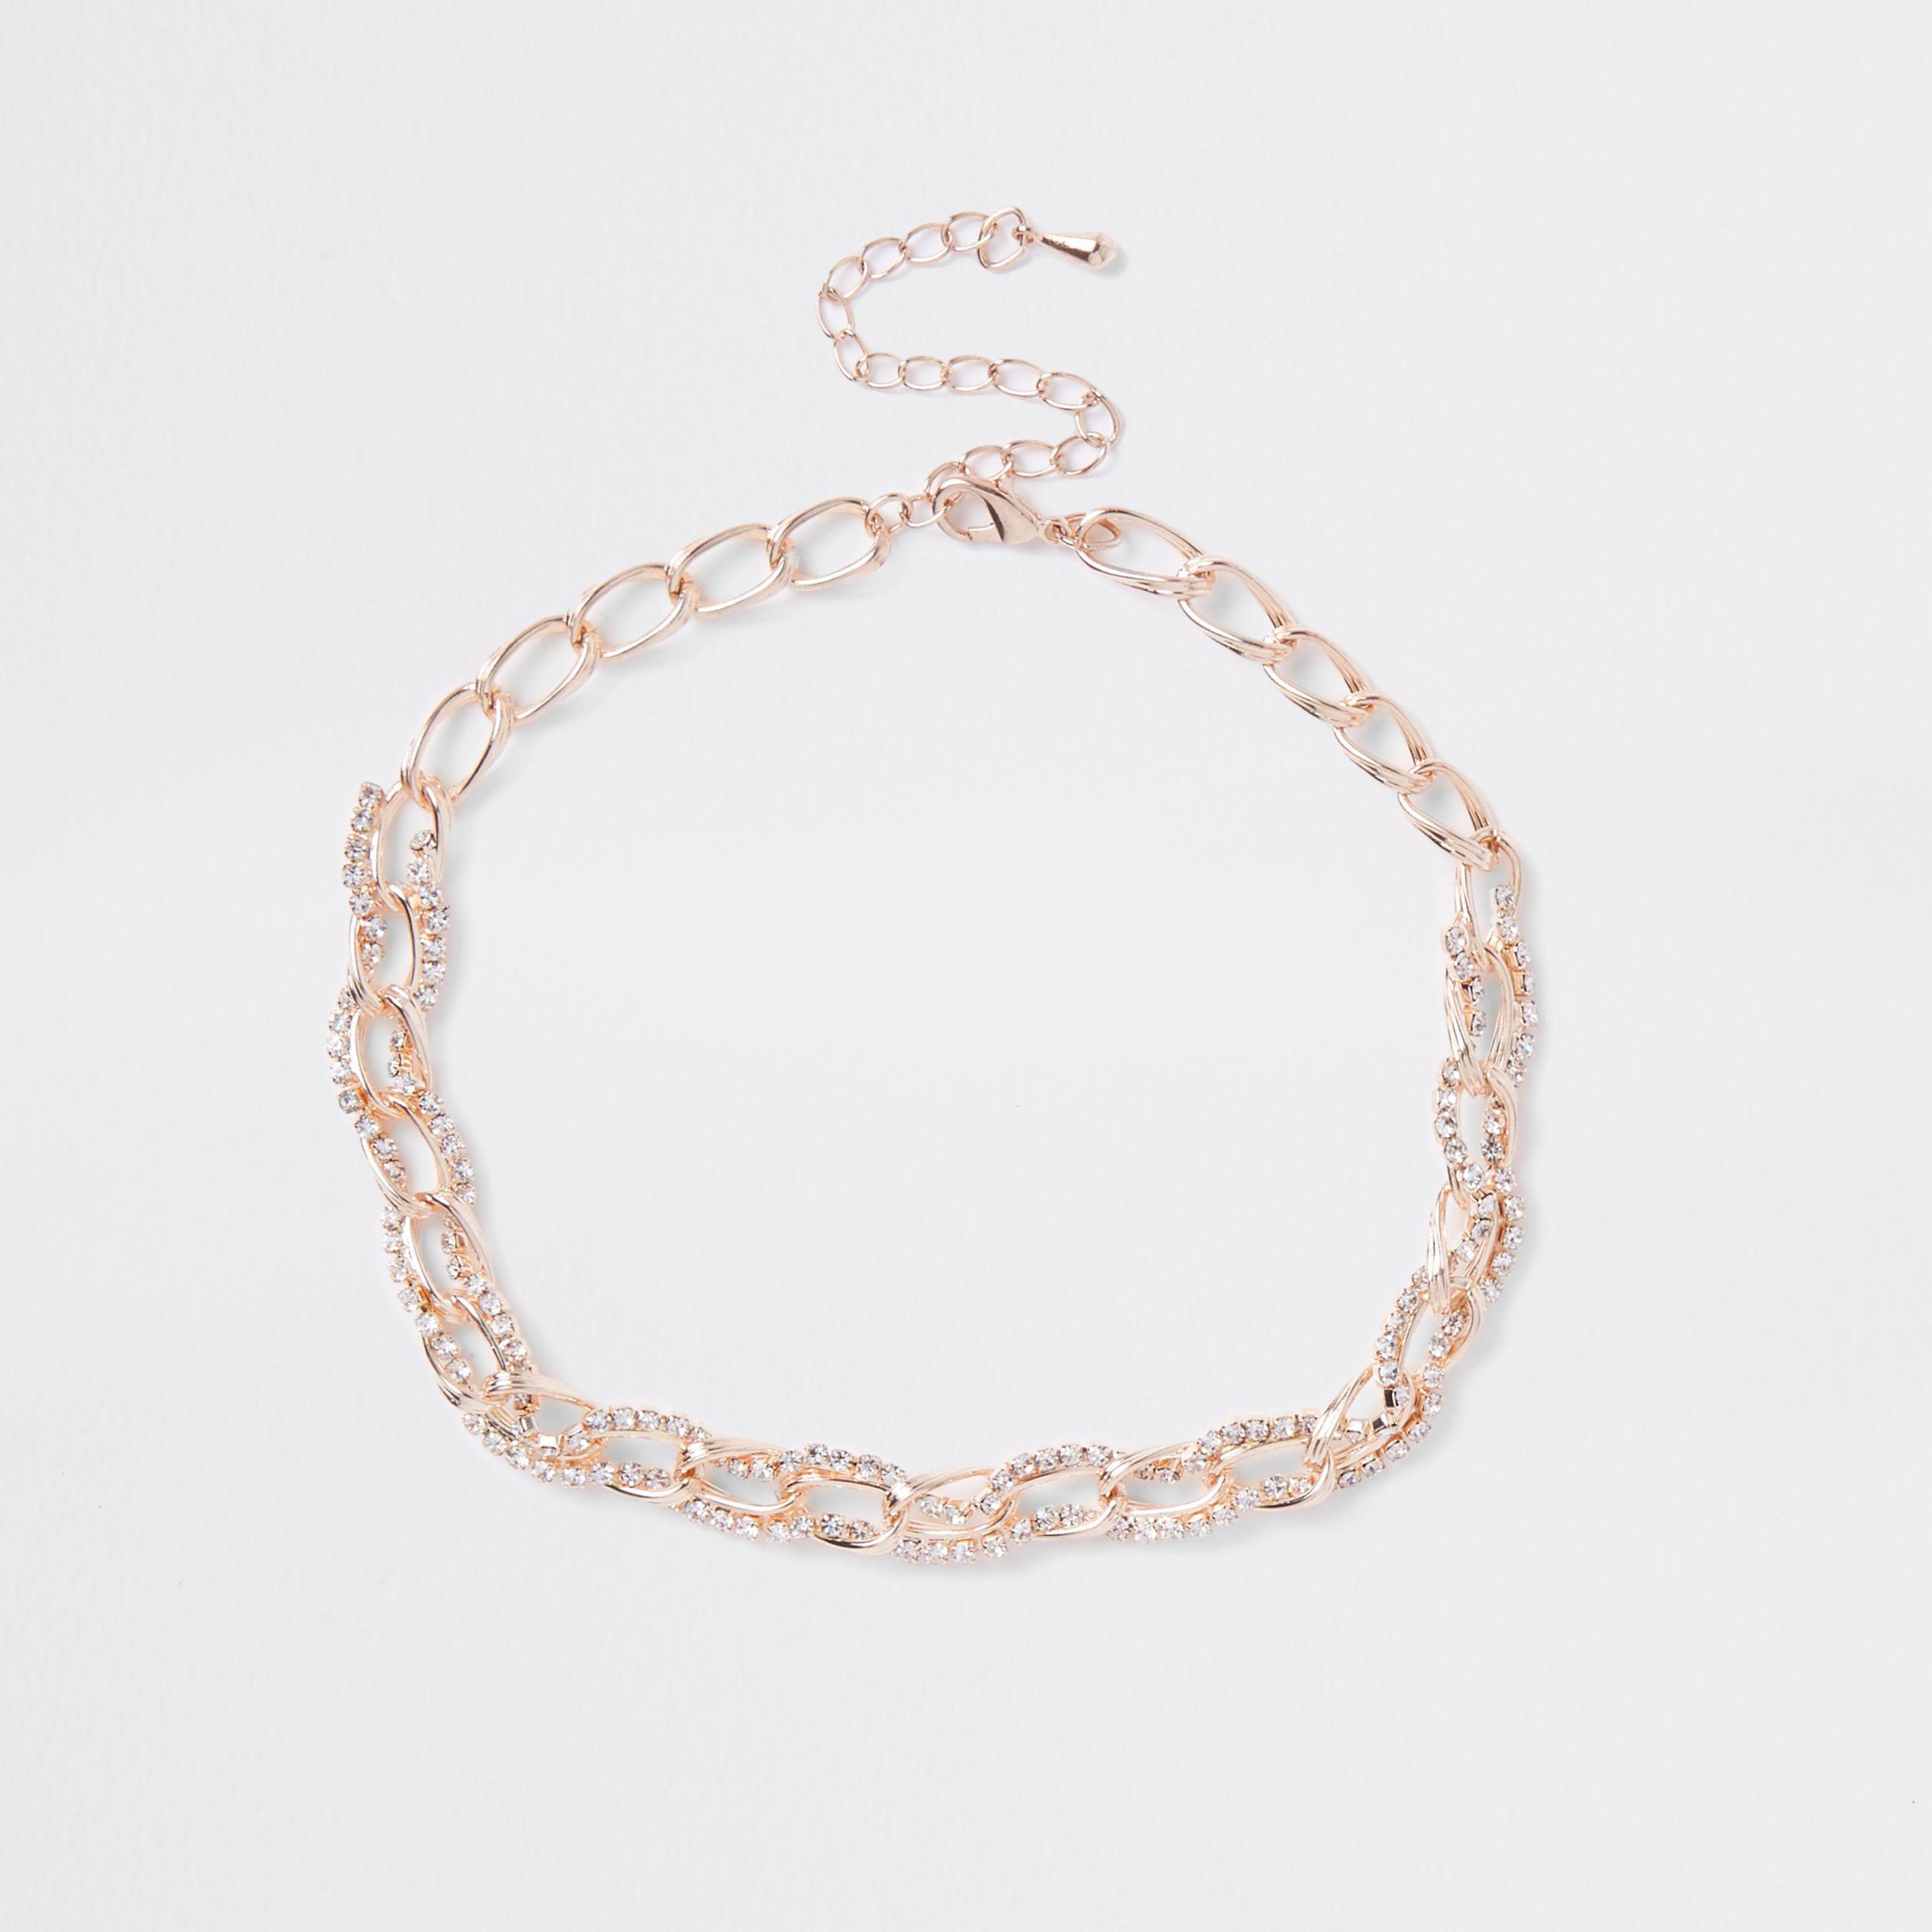 cabaf88f9183e River Island Rose Gold Diamante Chain Link Choker - Lyst